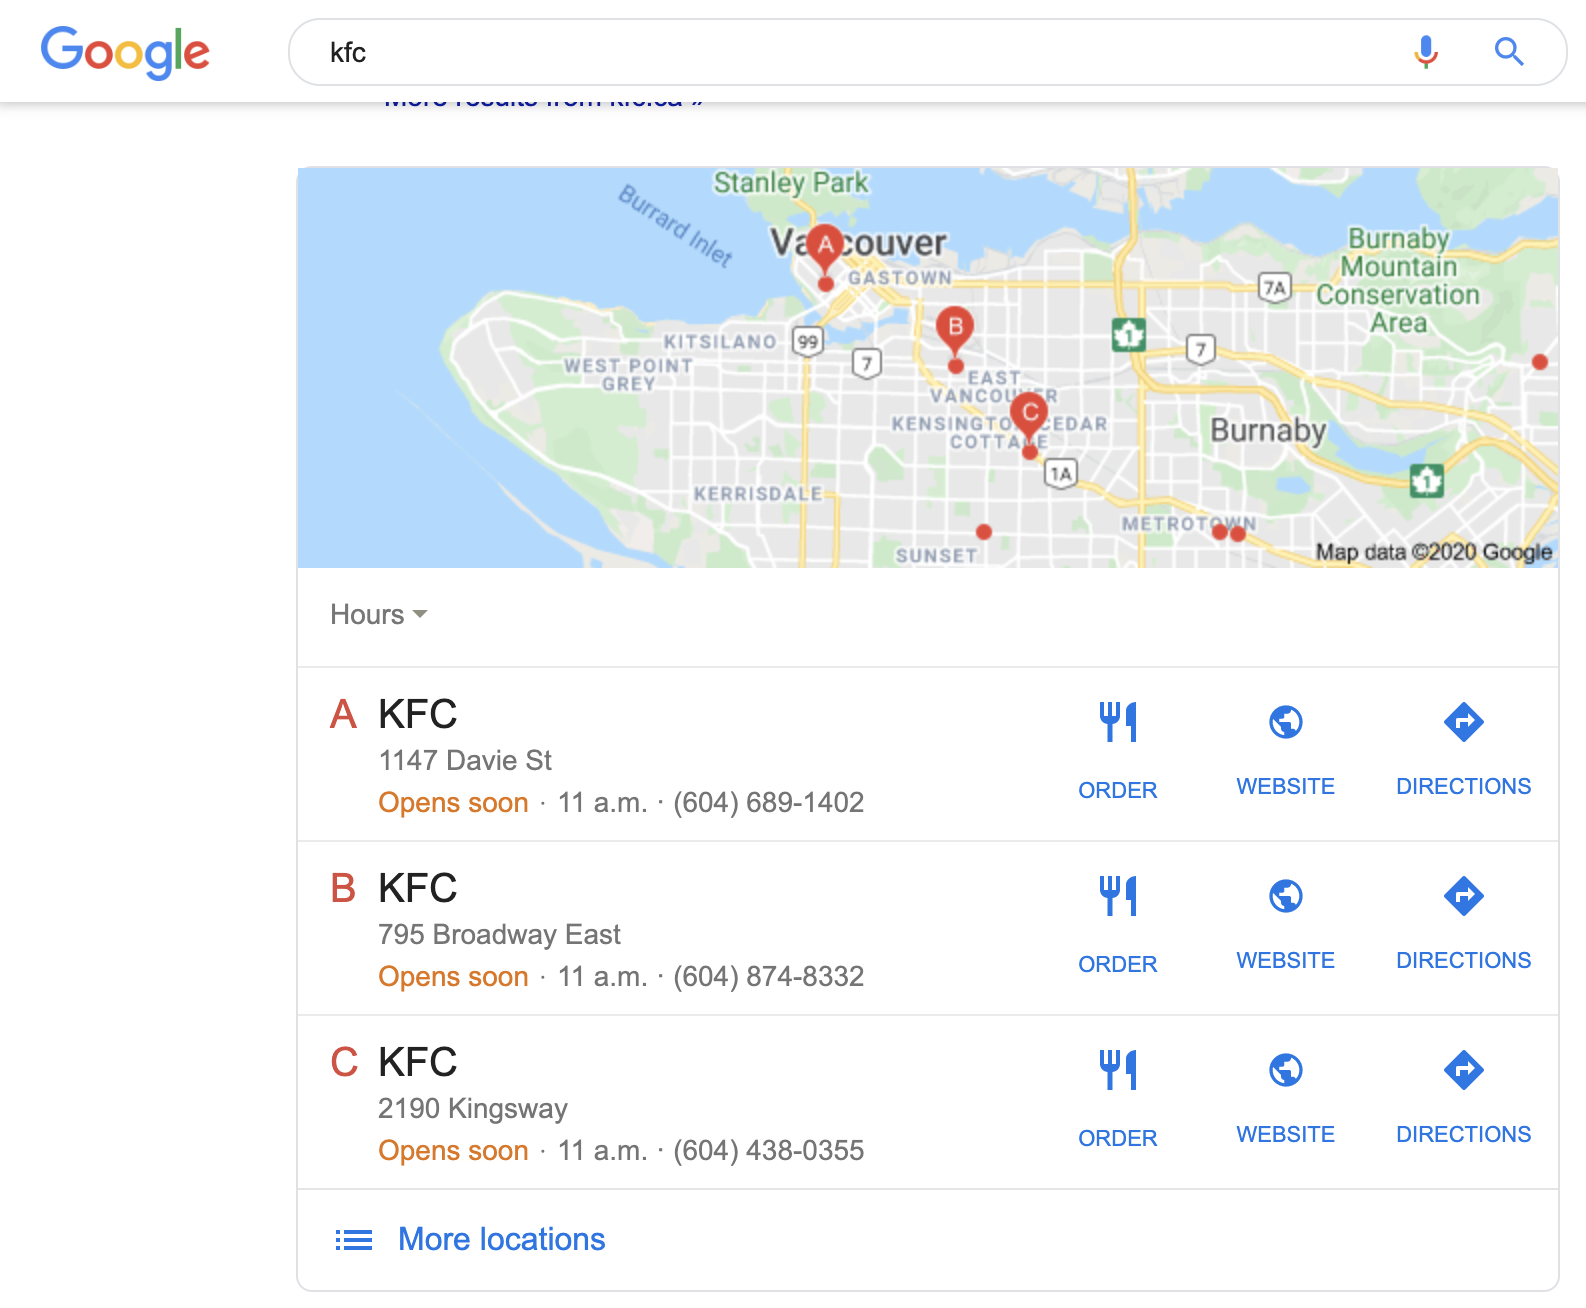 KFC Google ordering